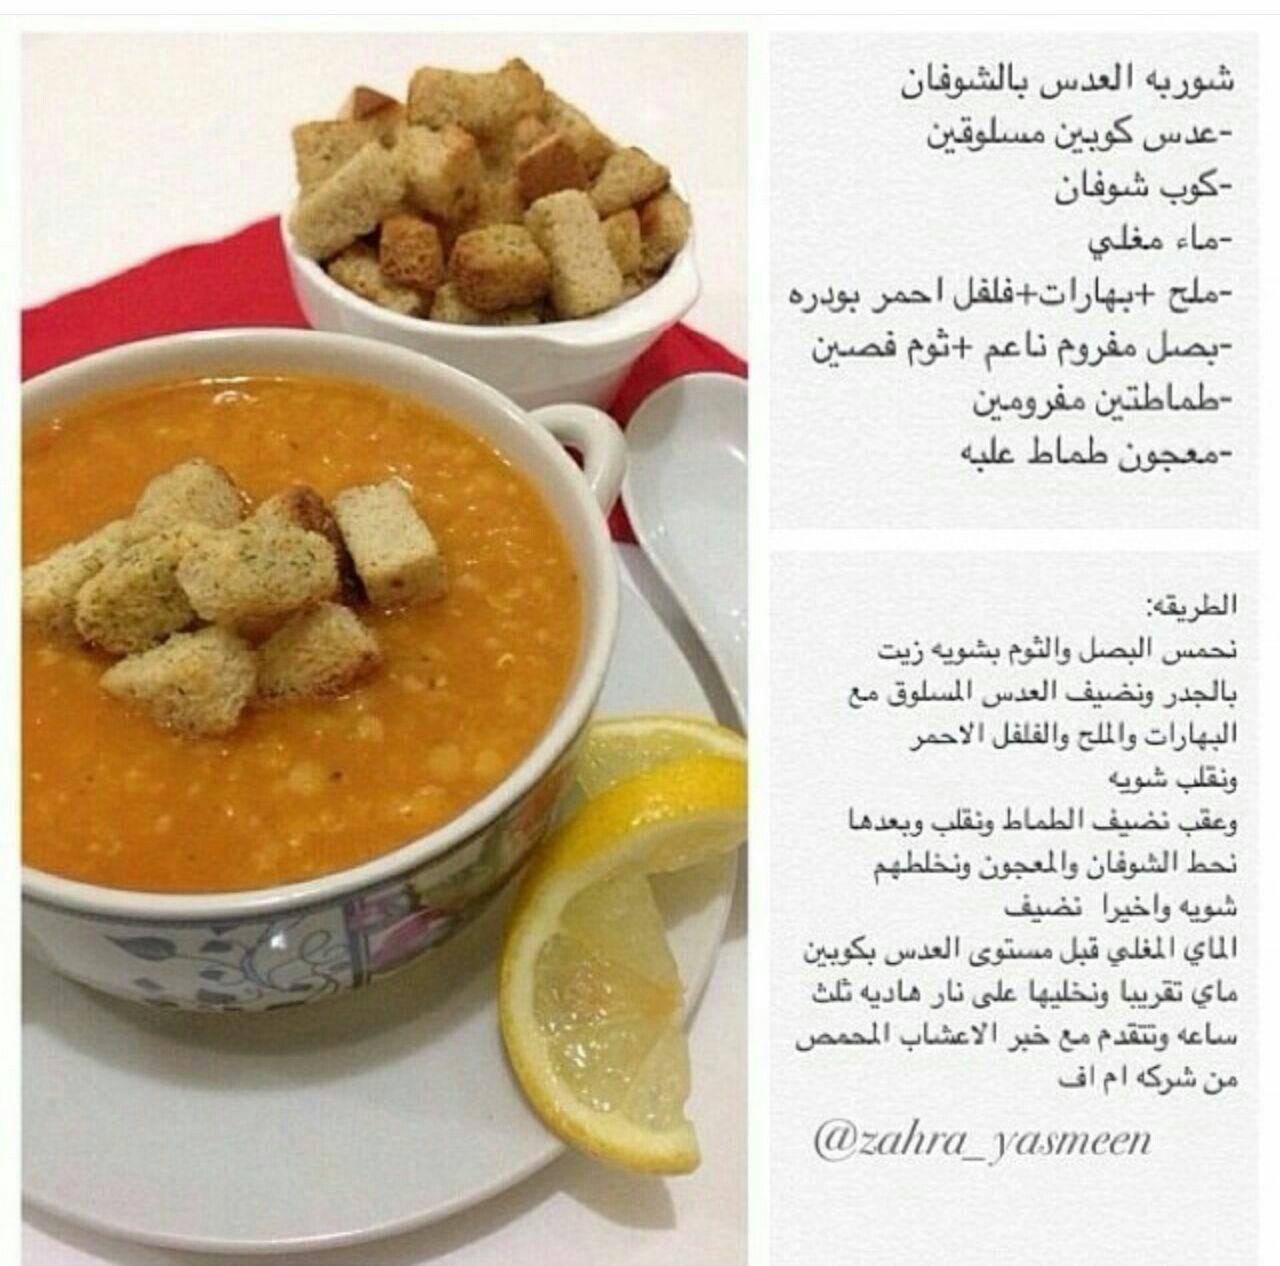 شوربة العدس بالشوفان Cookout Food Cooking Recipes Food Garnishes